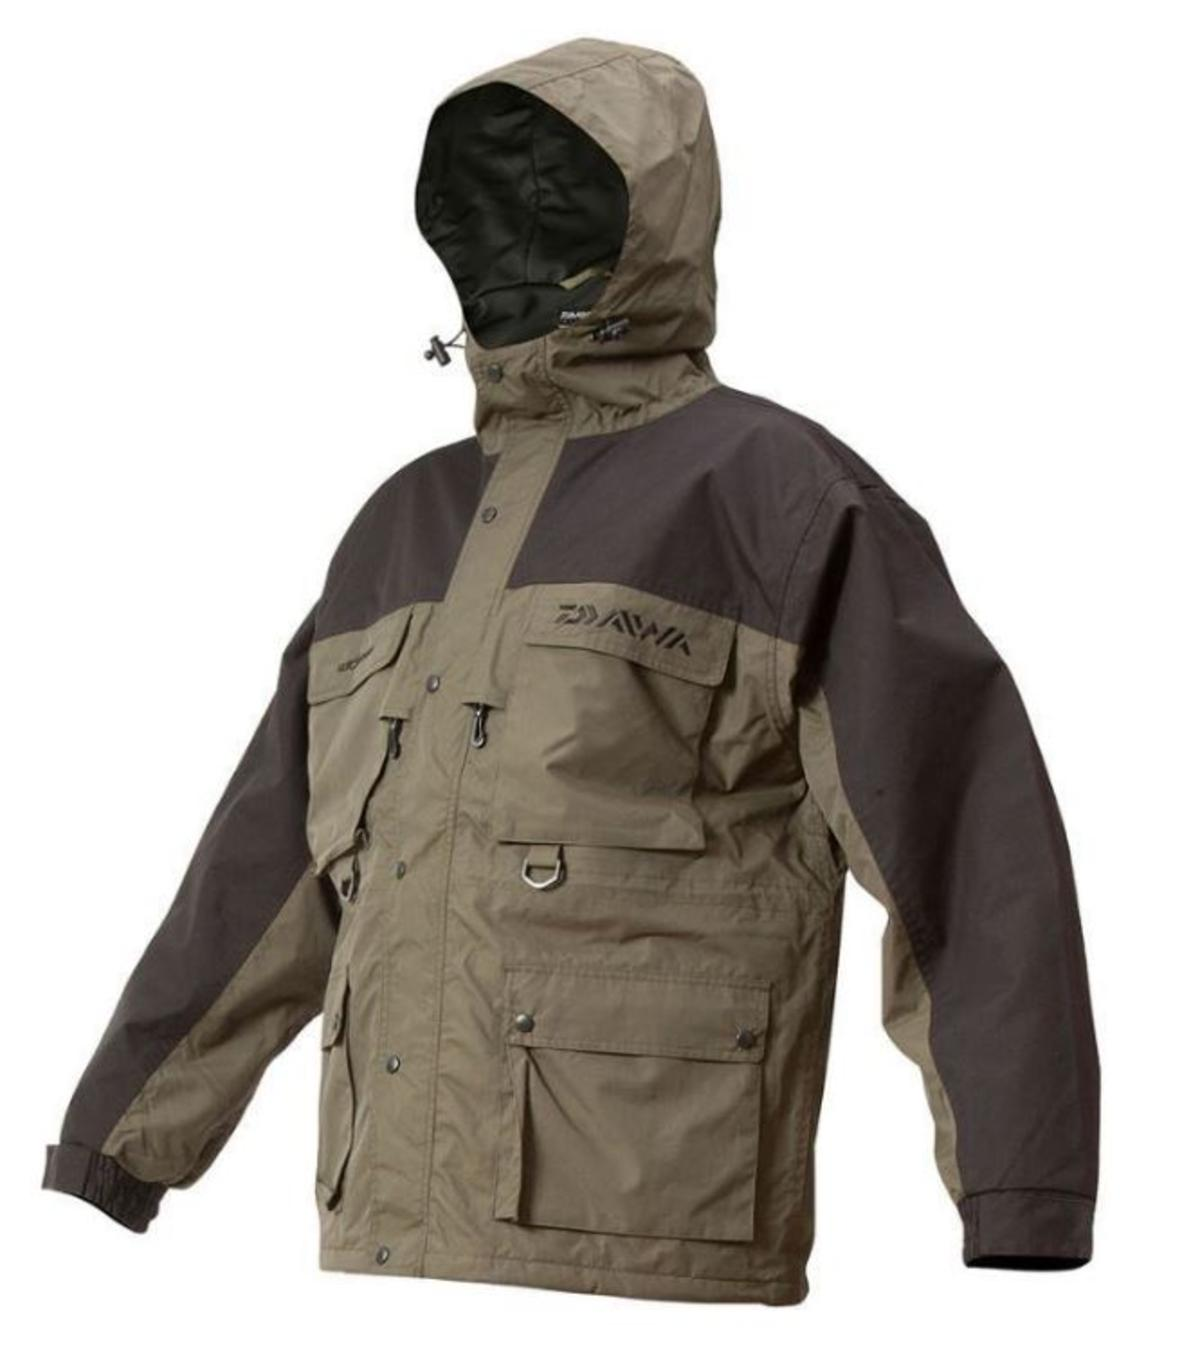 Ex Display Daiwa Wilderness 3/4 Jacket - Size Large - DWJ-L